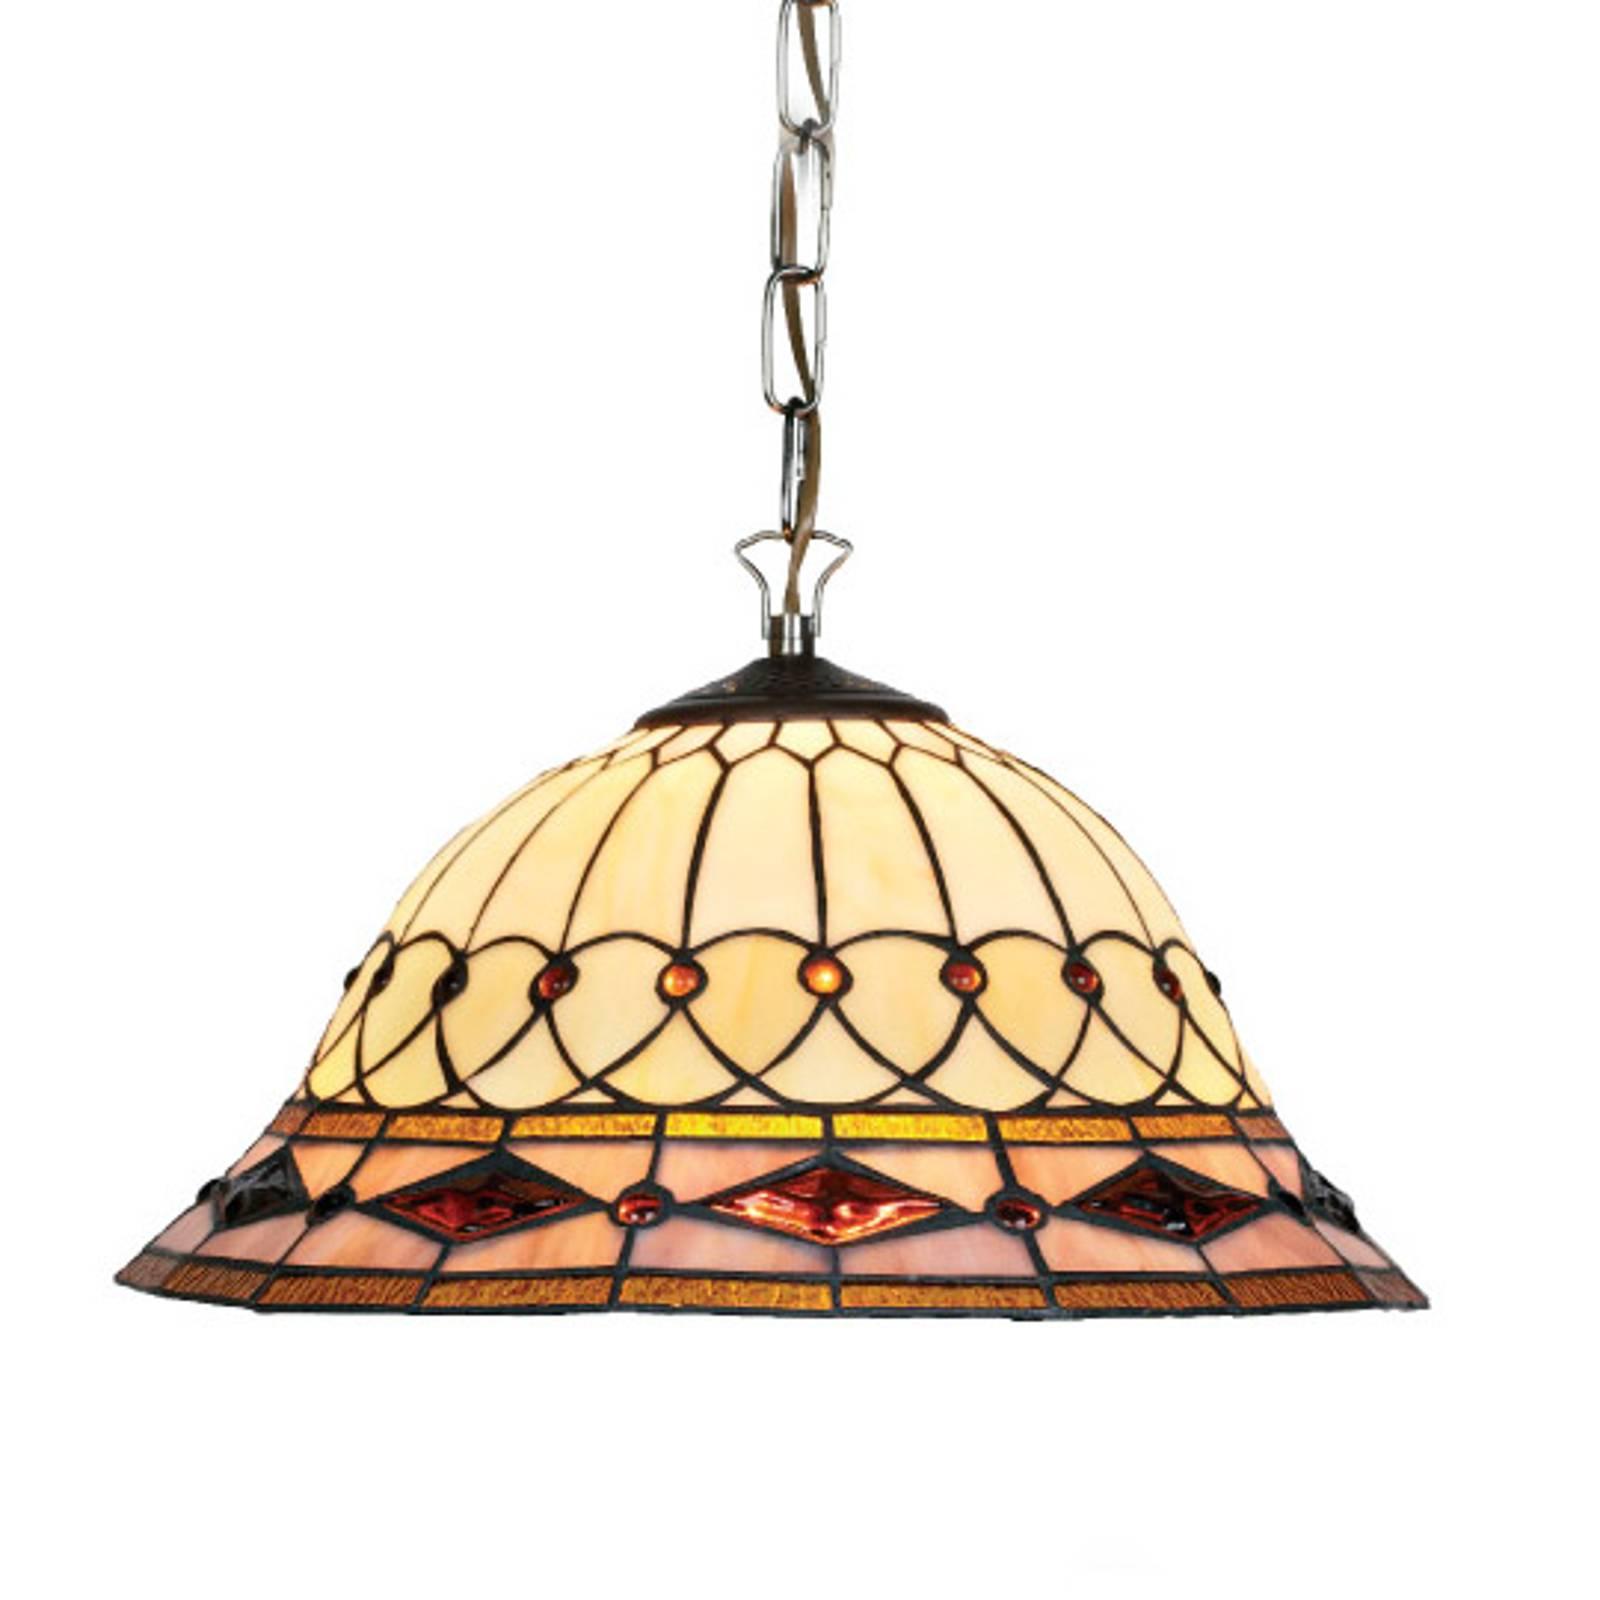 Hanglamp Kassandra in Tiffany-stijl 2-lichts